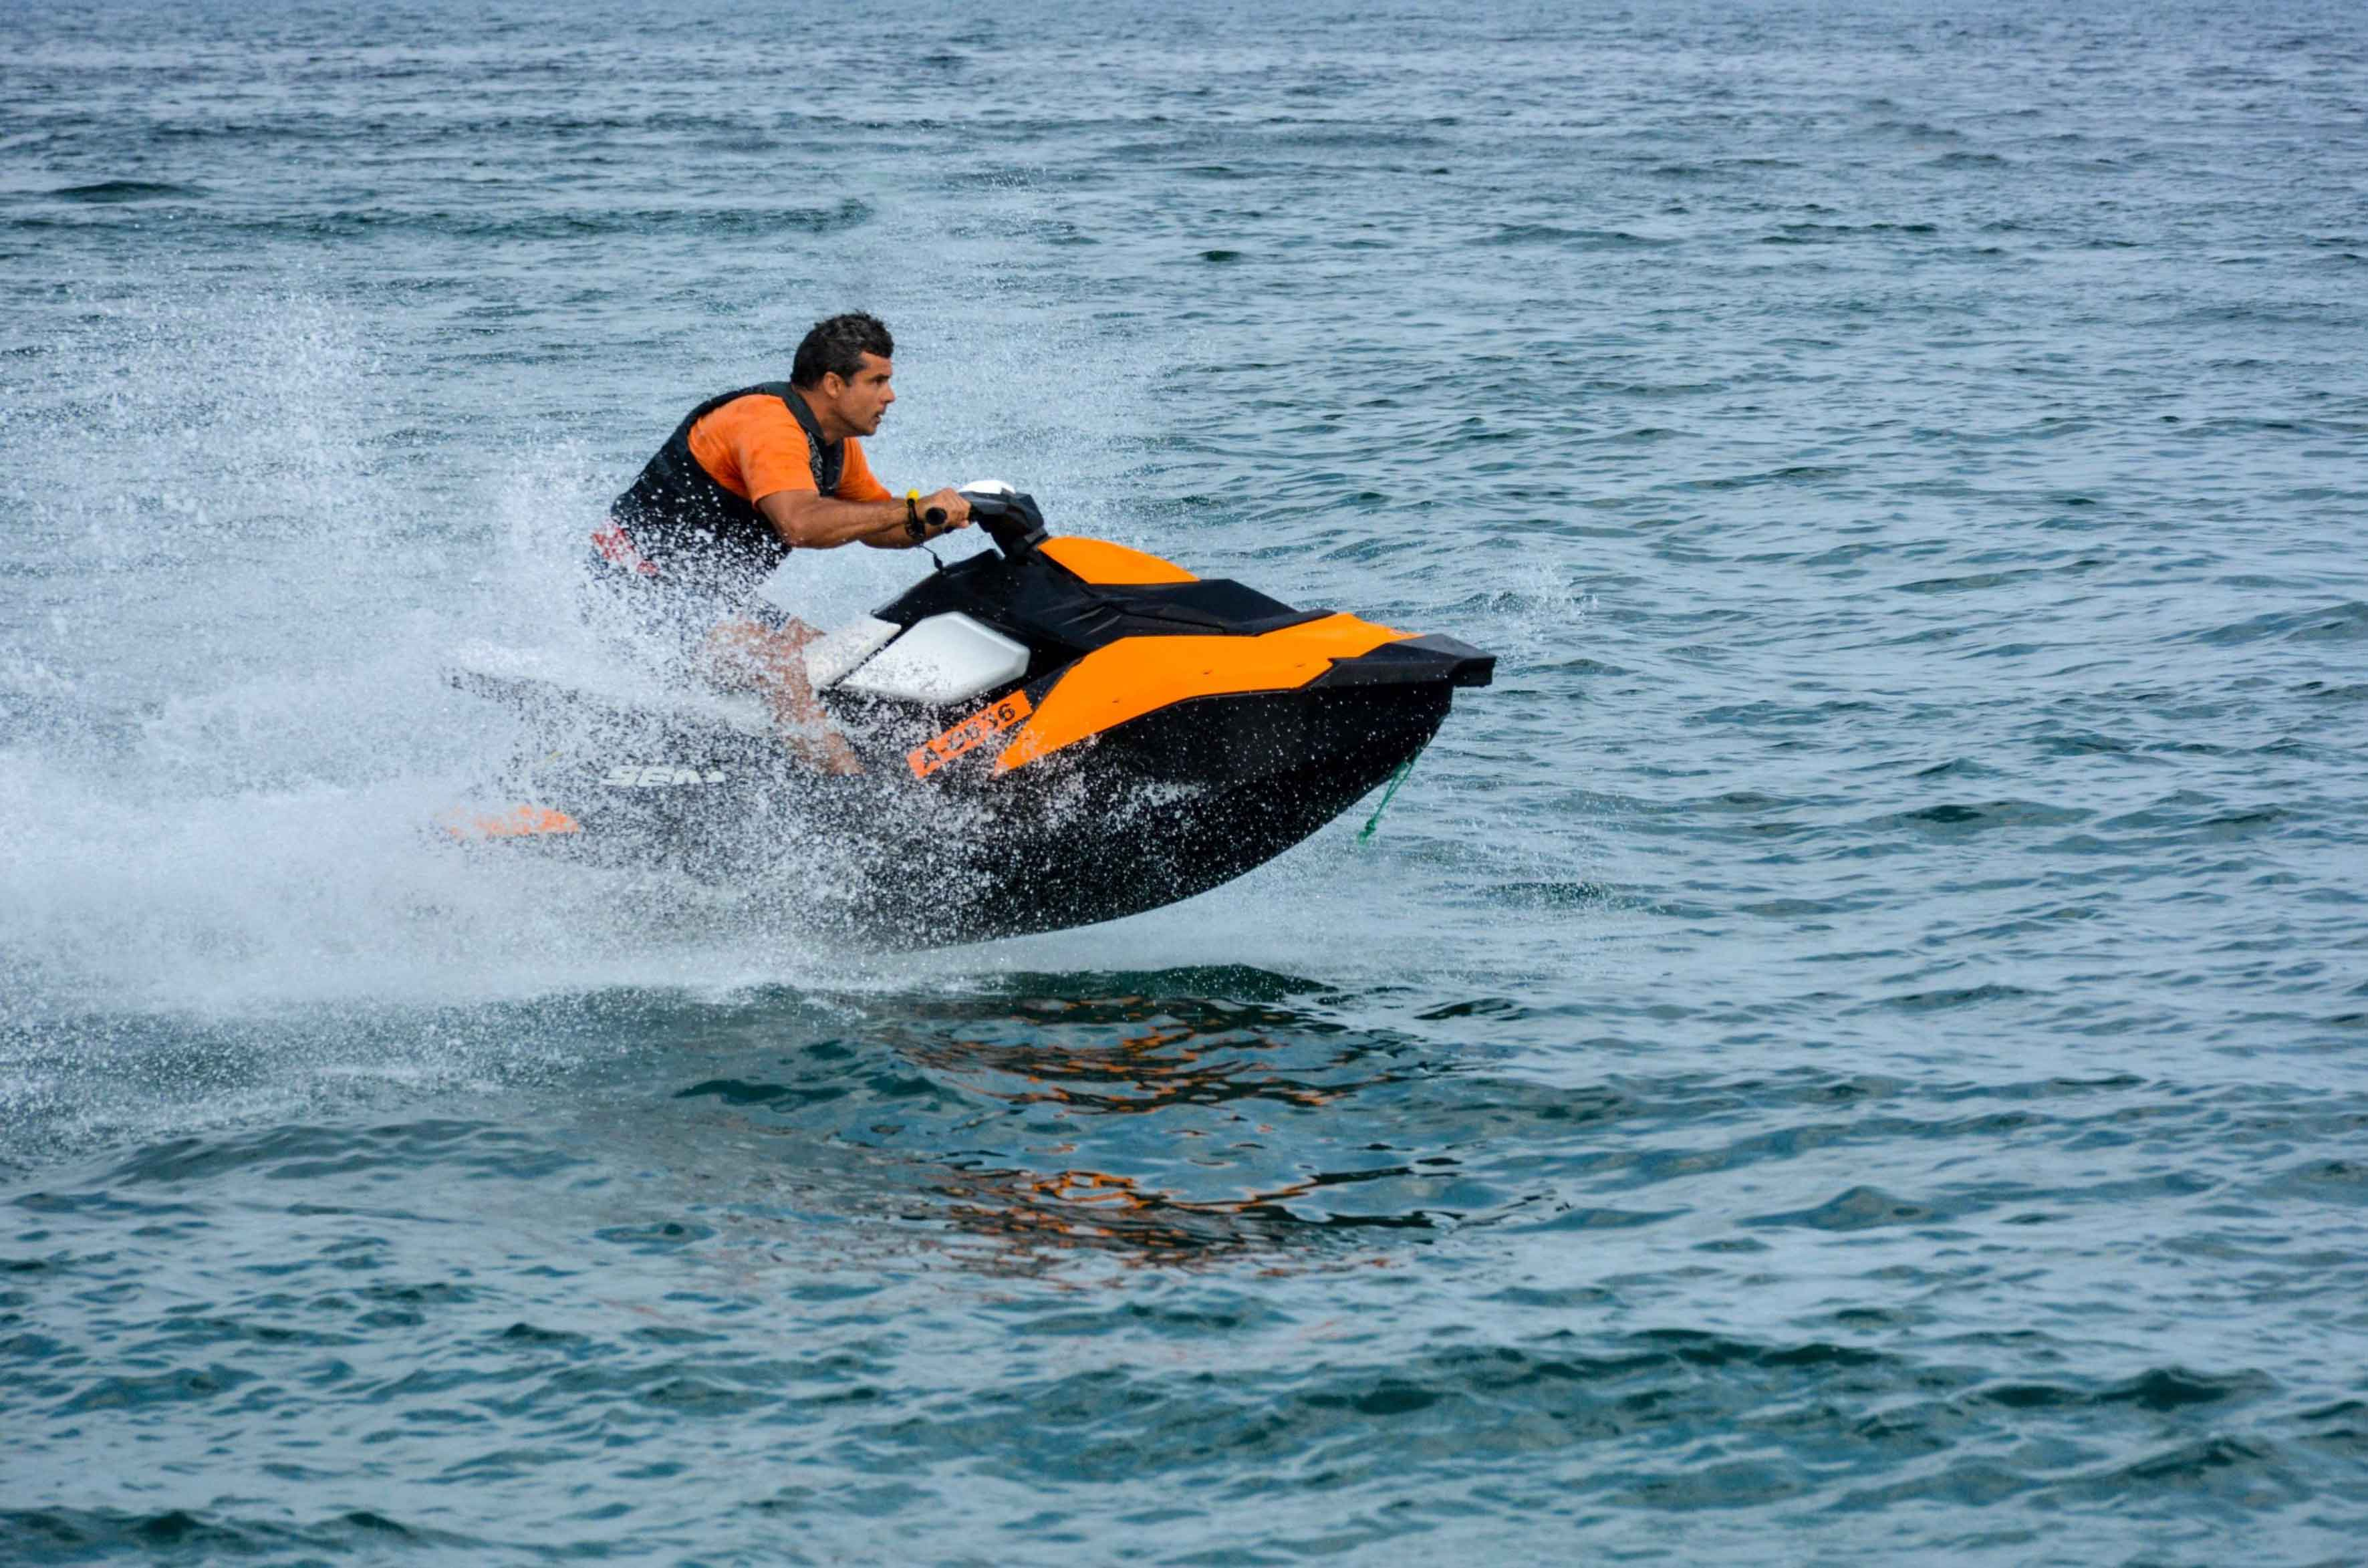 Sea Rescue by Ivan Kristoff